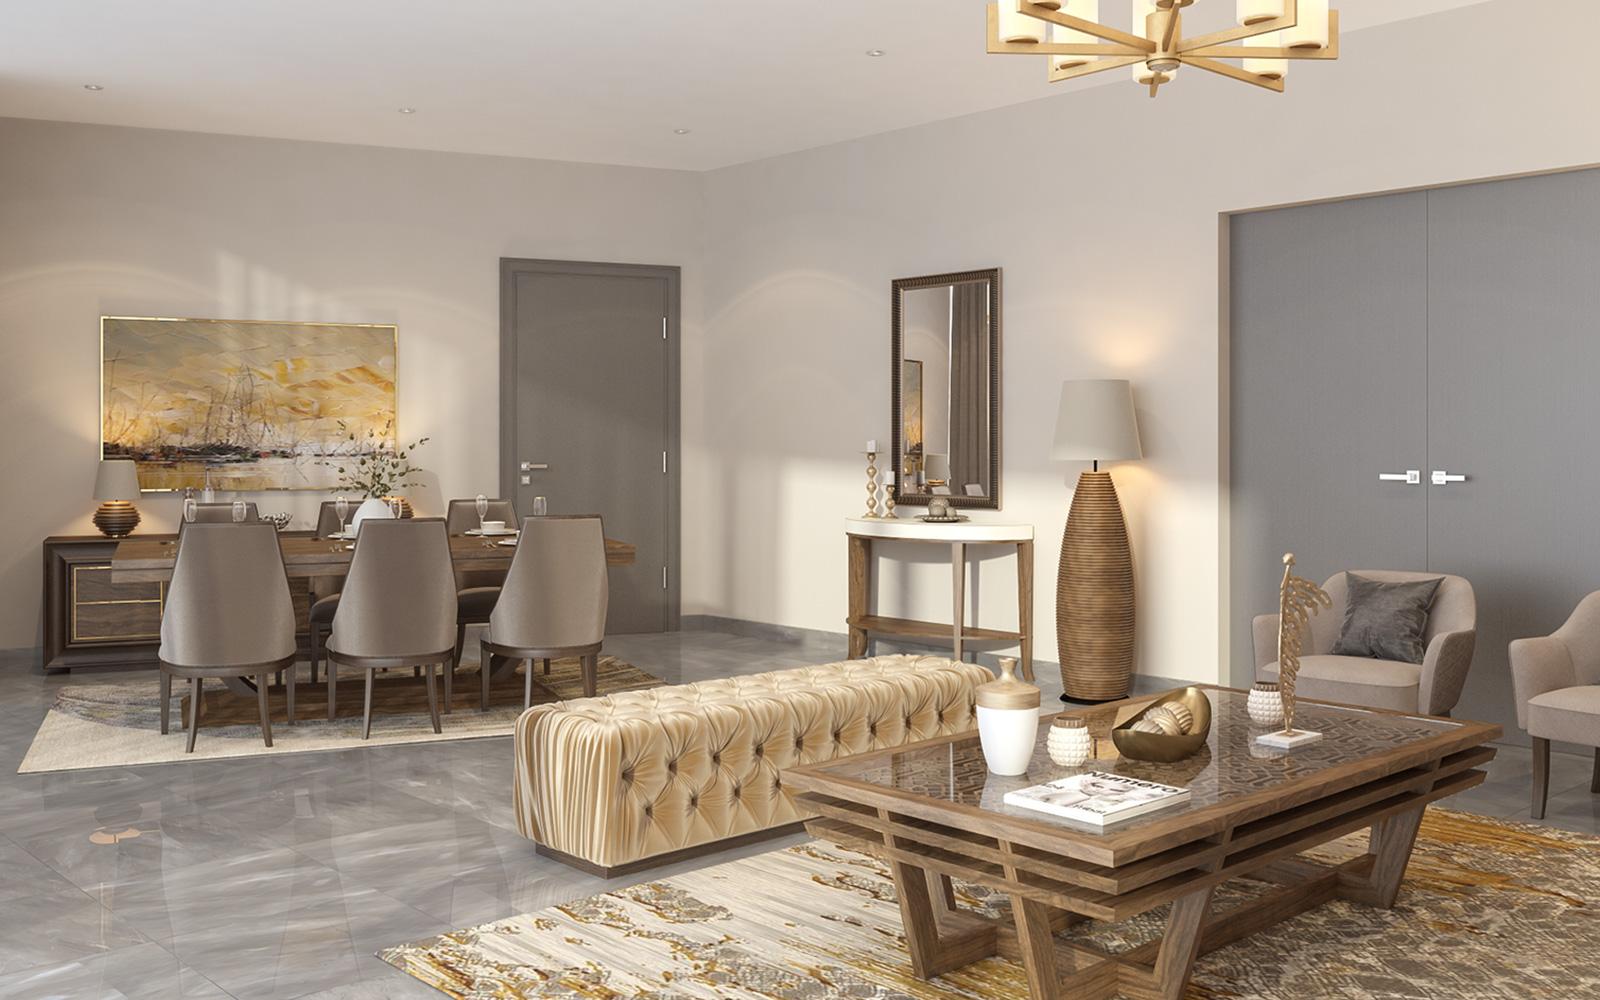 Vogue Design - Saudi Arabia Beyat Plaza4